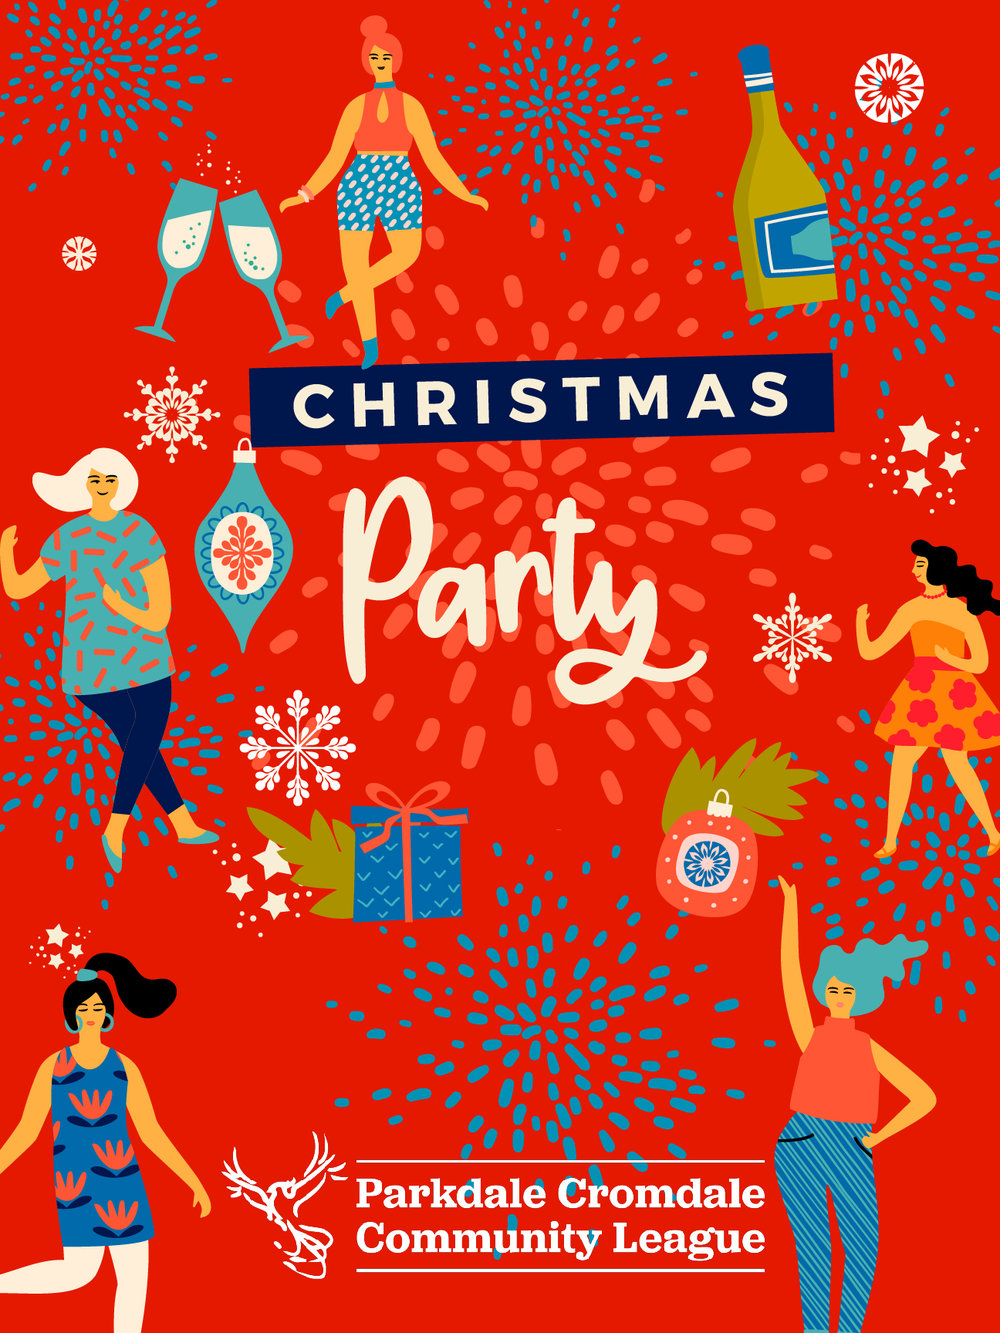 ChristmasParty2018Web-01.jpg